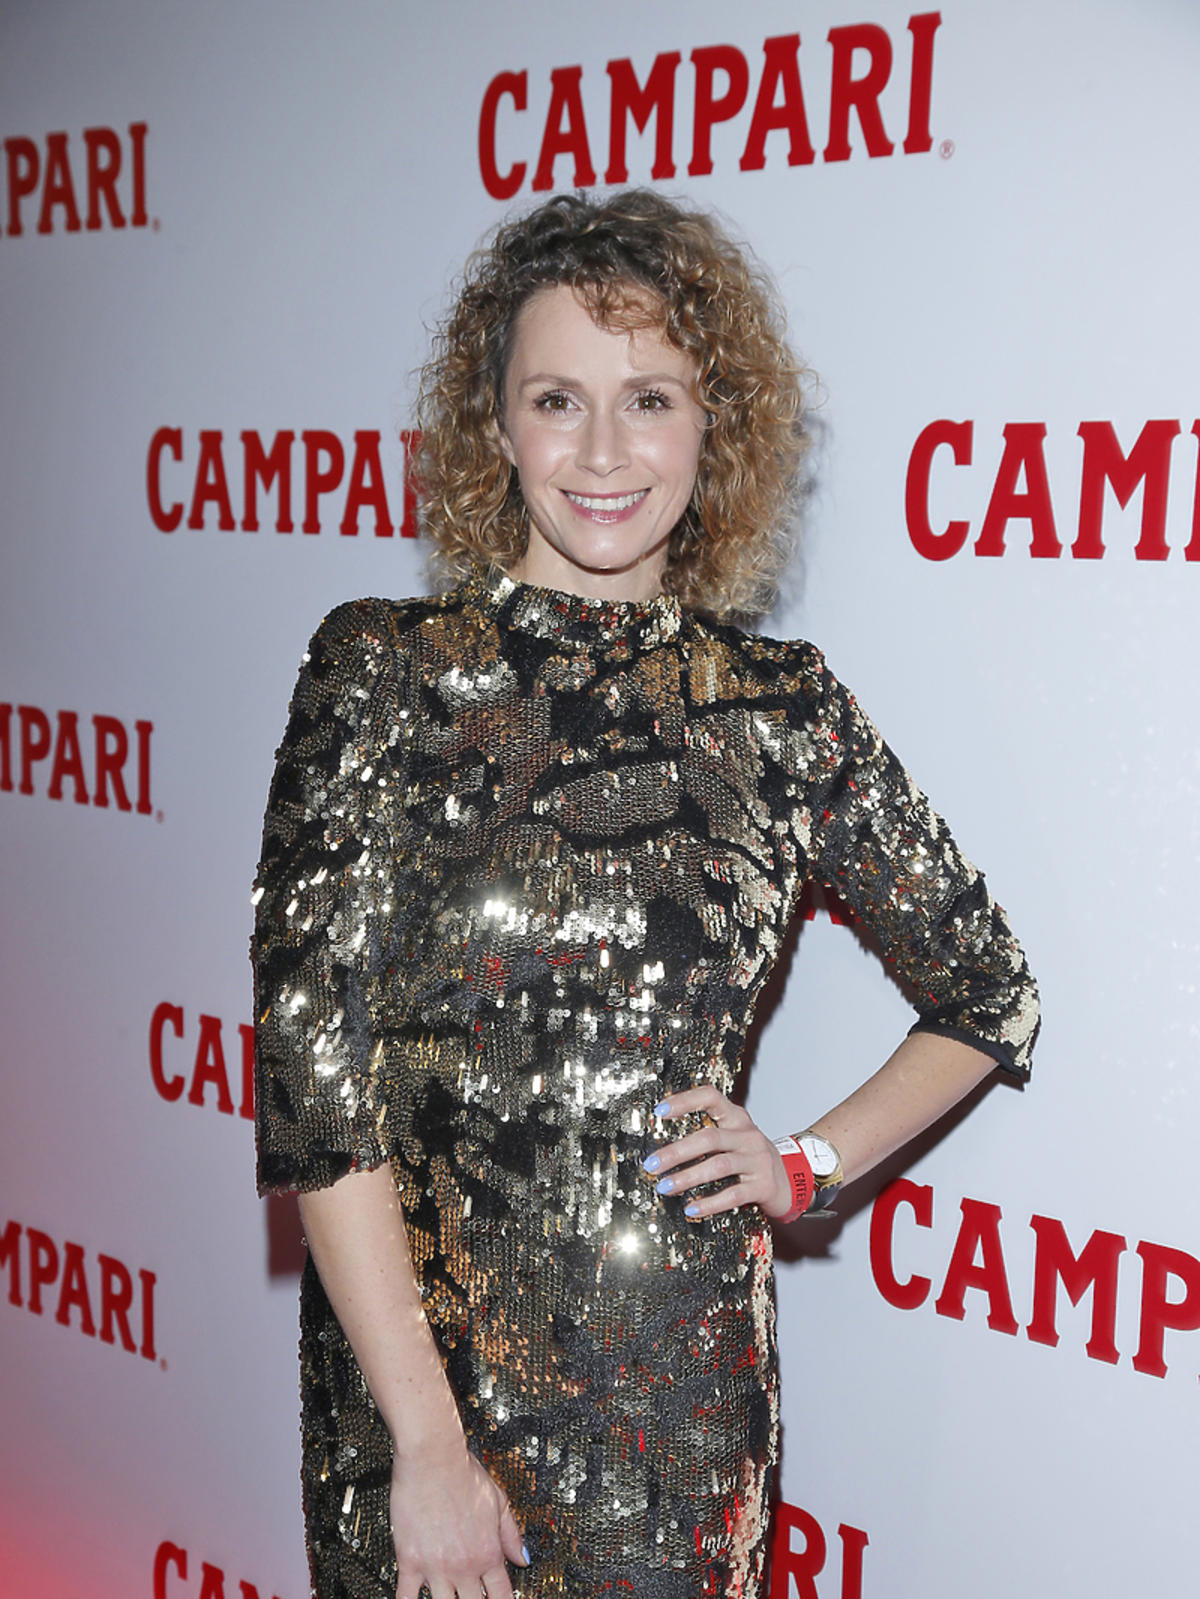 Otwarcie Pop Up Bar Campari  - Monika Mrozowska